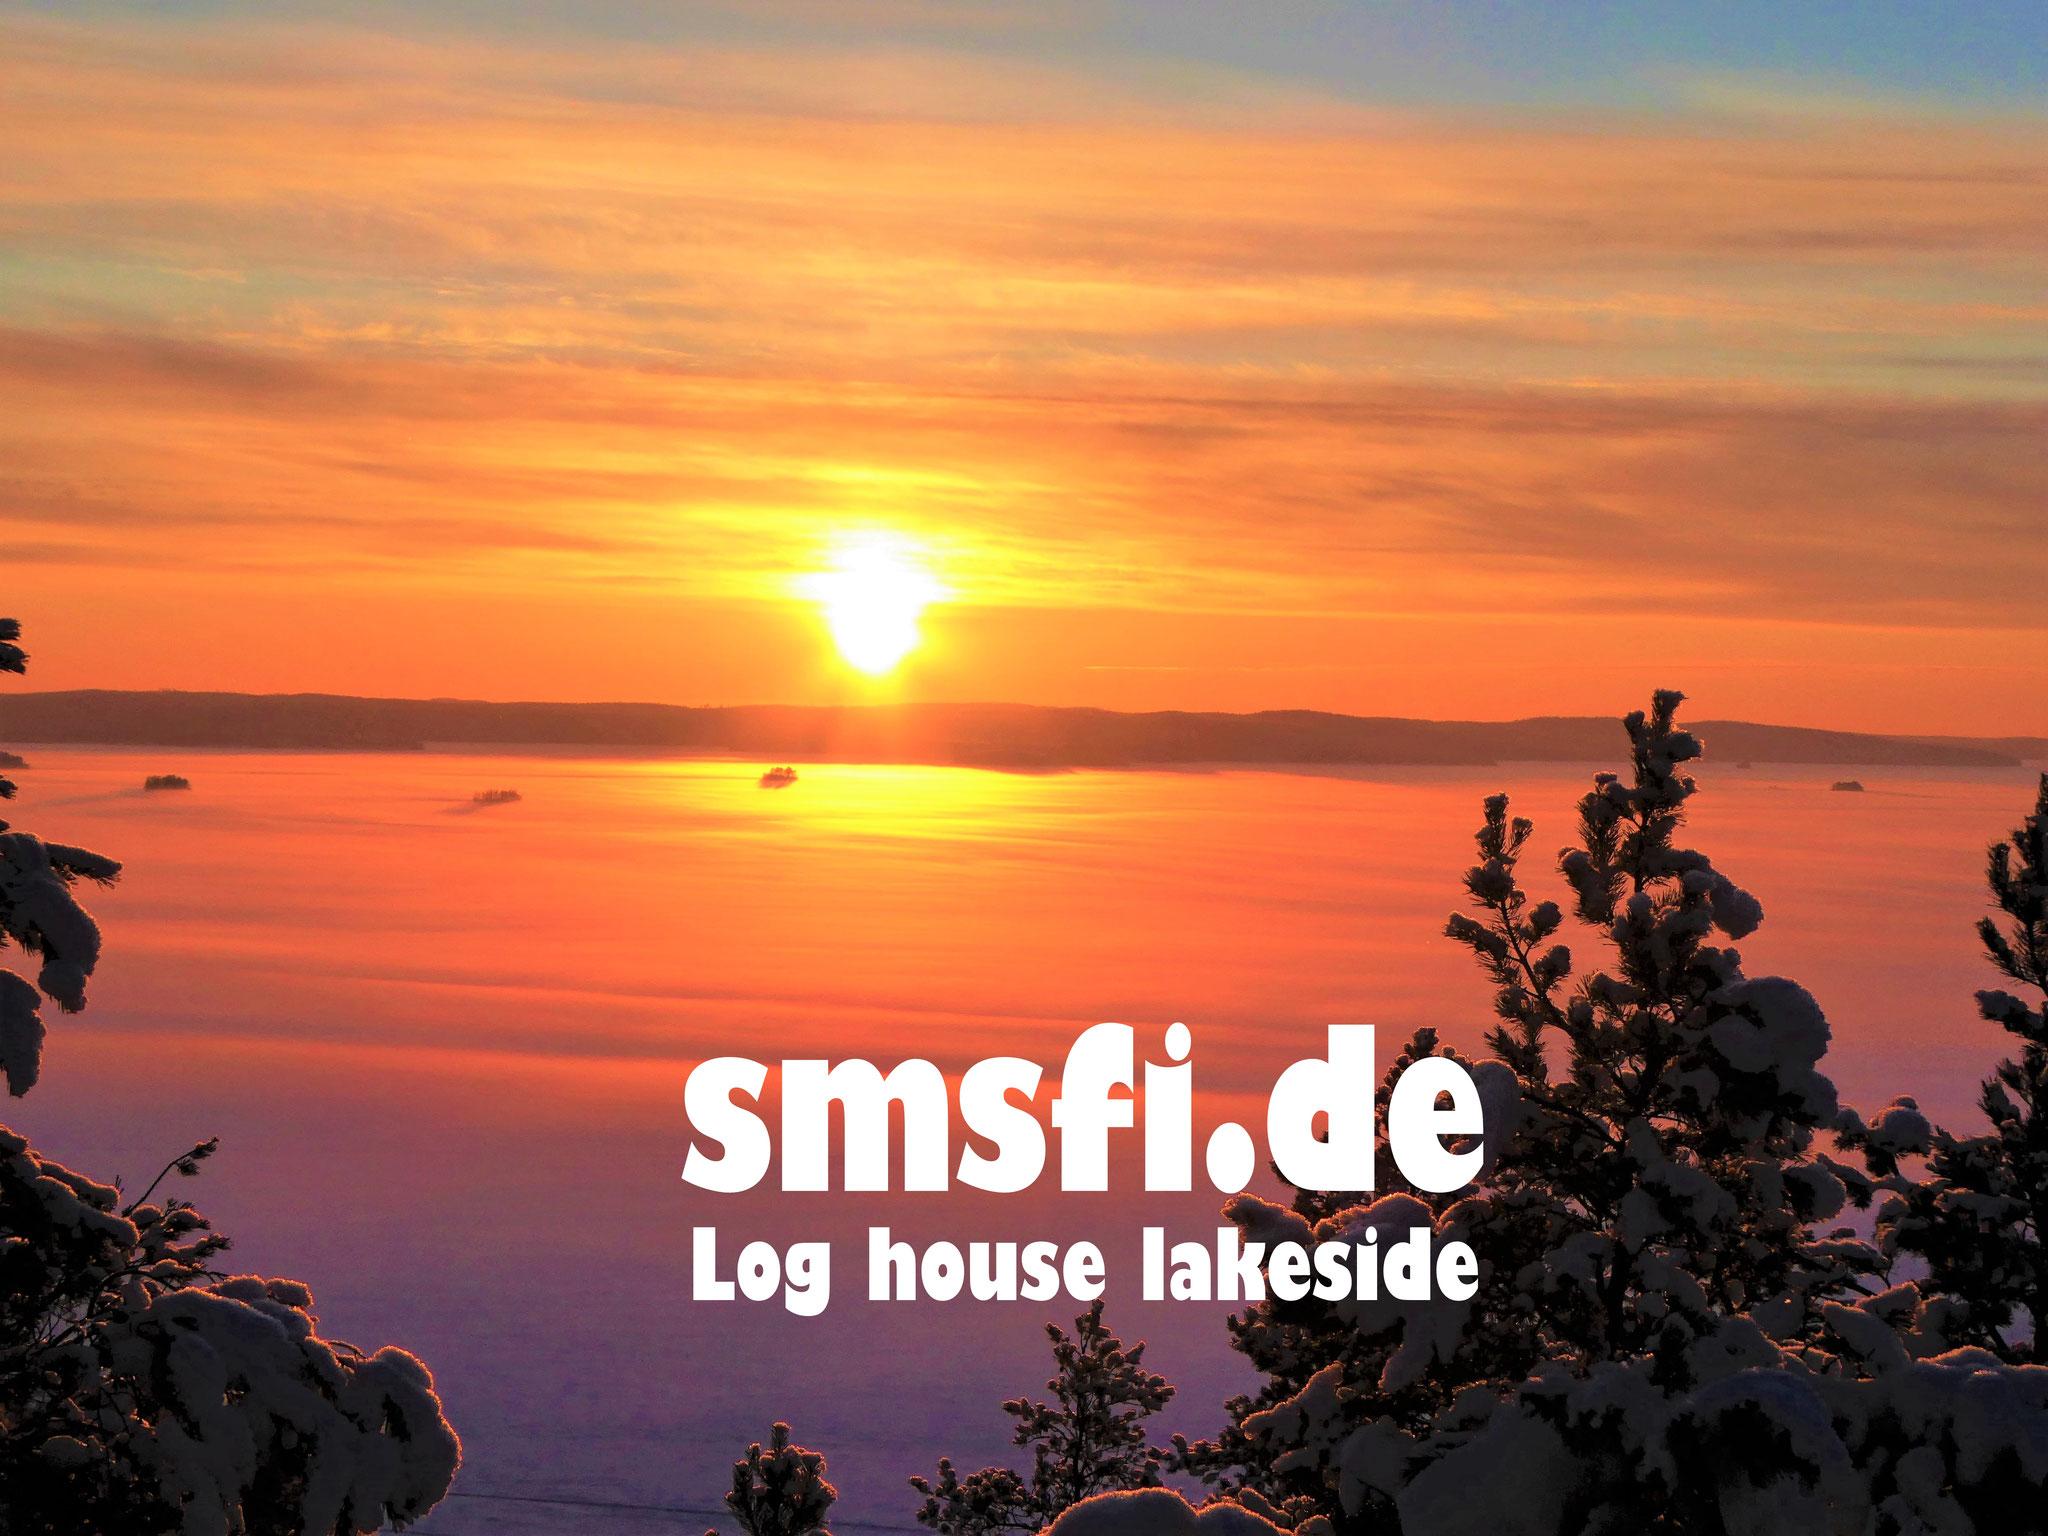 "Sunset at Winter Wonderland Lake Päijänne. View from the observation tower 1.5 km from the log house ""Sunny Mökki Sysmä"""